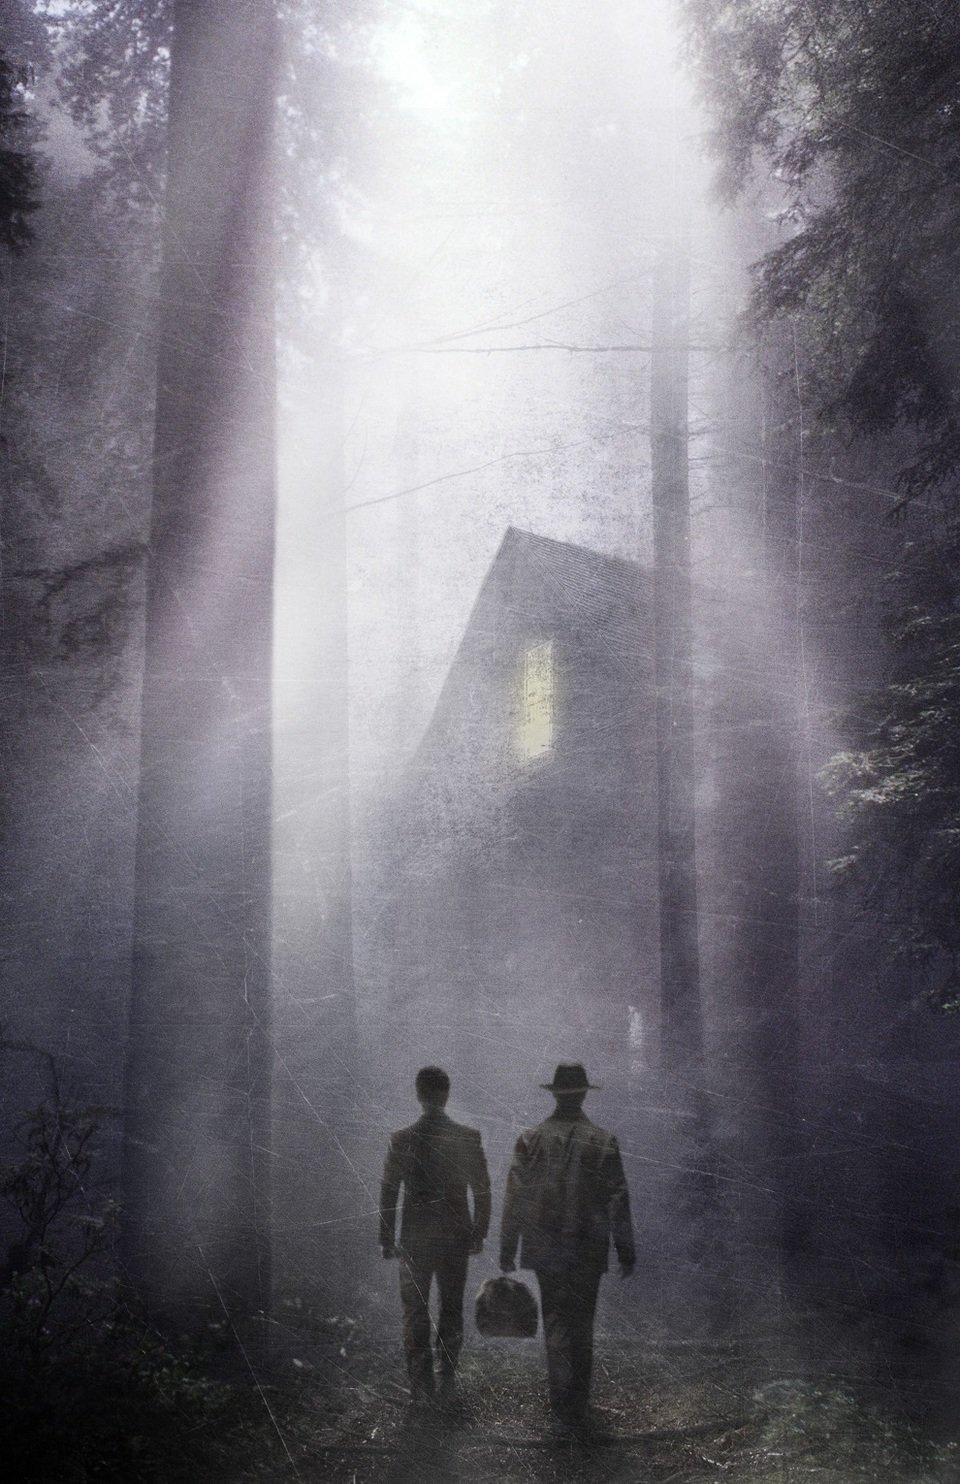 Exorcist-The_02_Dom_11x17_Cabin_MiniPoster_KA (2).jpg